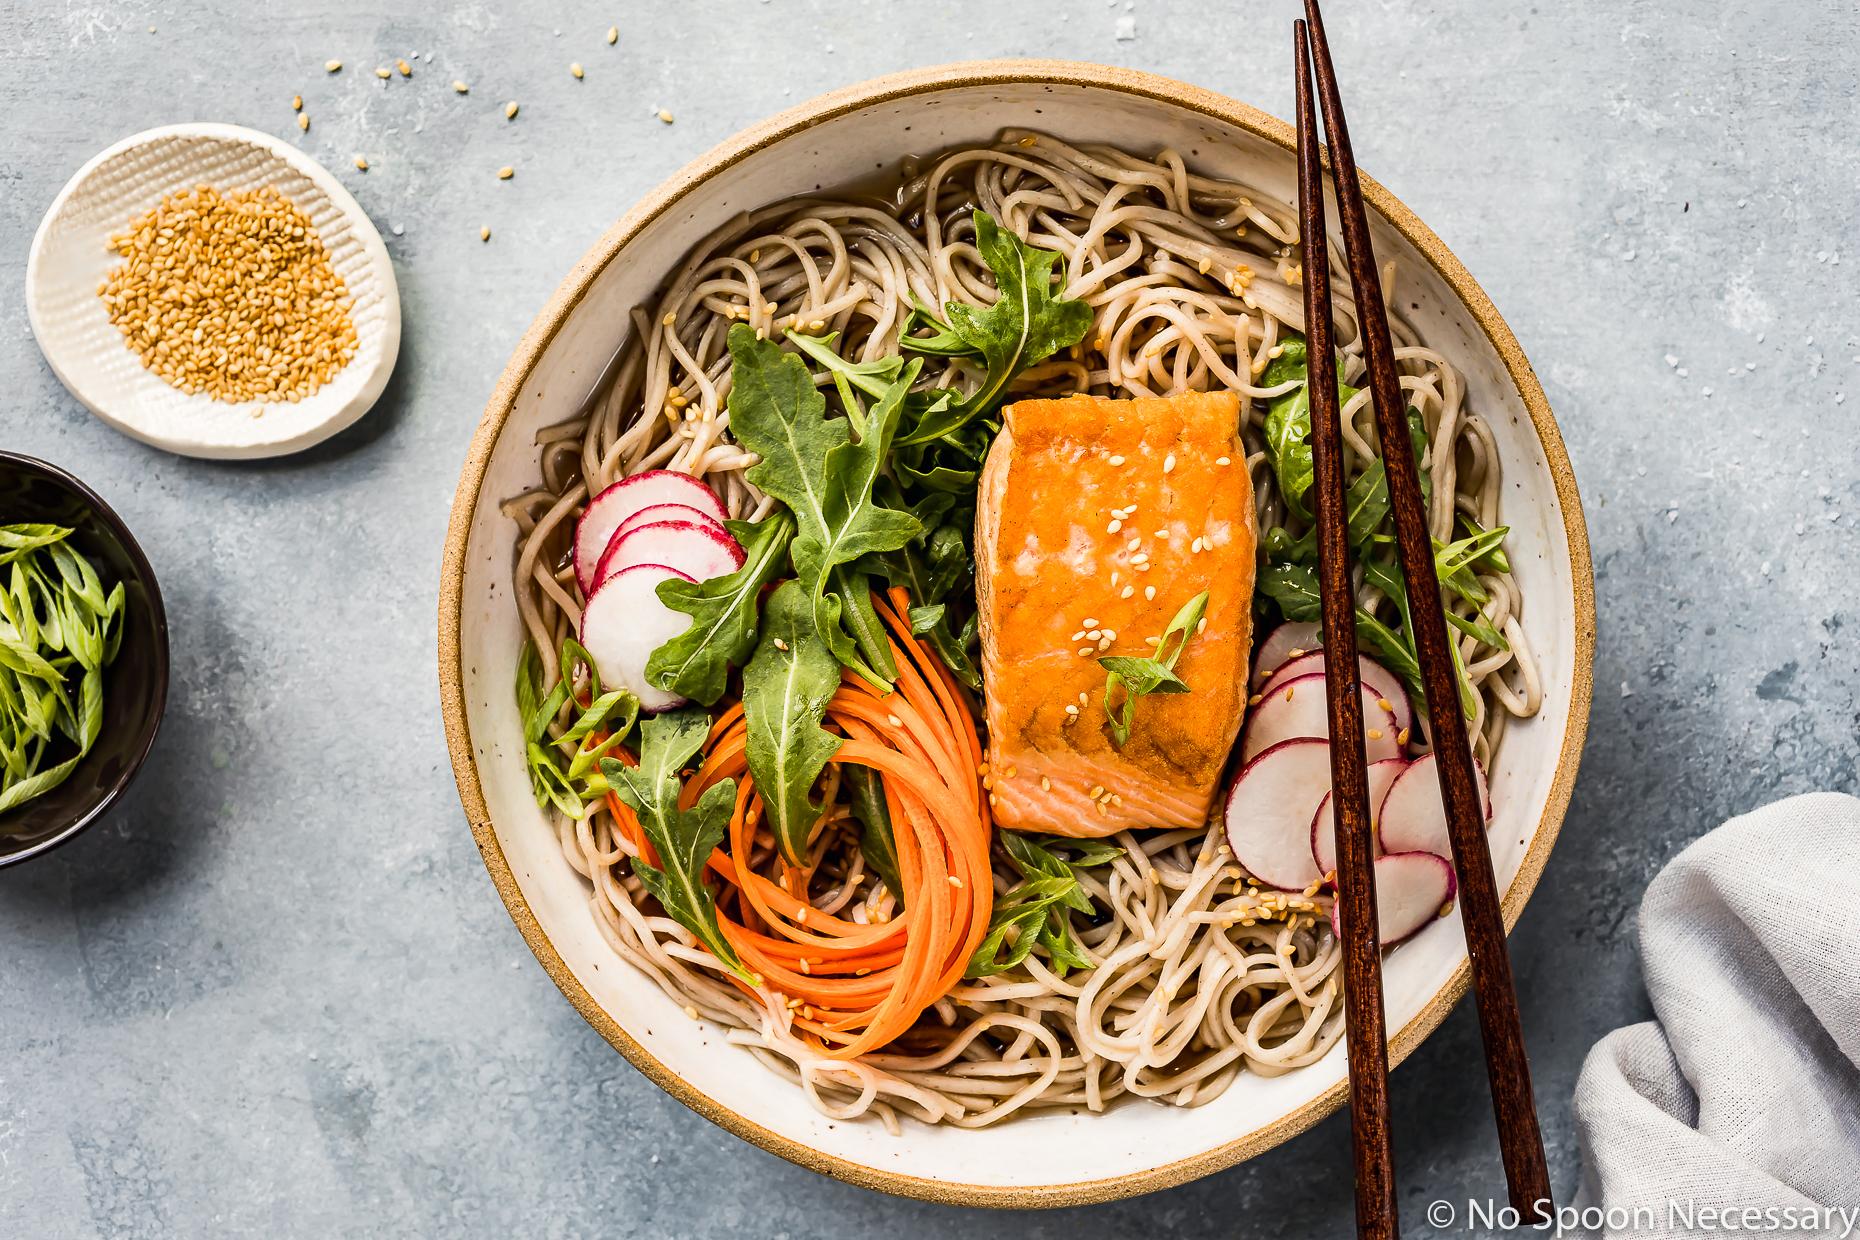 Green Tea Poached Salmon Soba Noodles